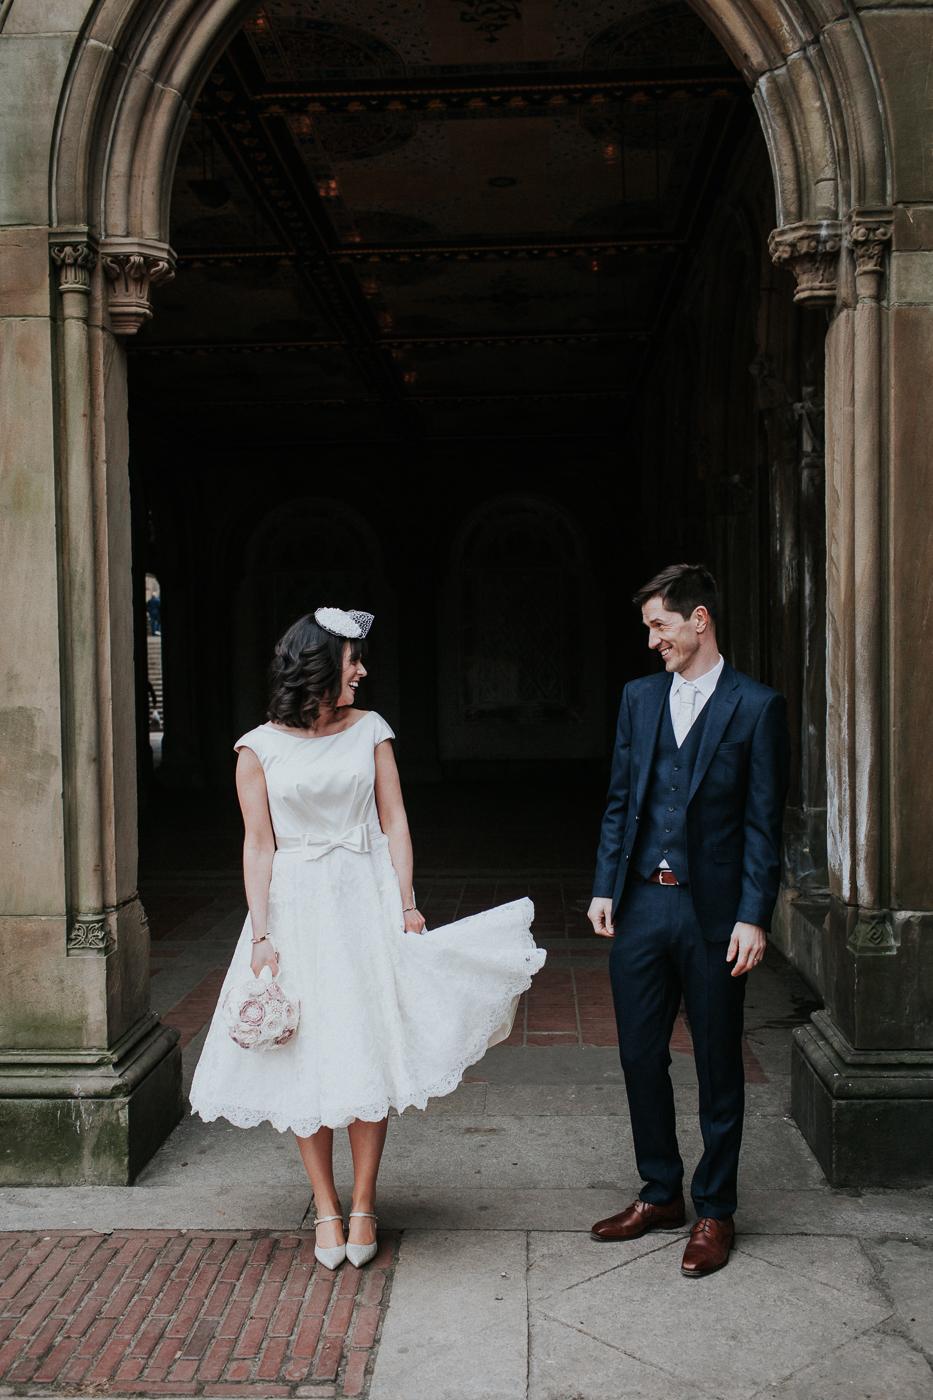 Ladies-Pavilion-Central-Park-NYC-Documentary-Elopement-Wedding-Photographer-57.jpg